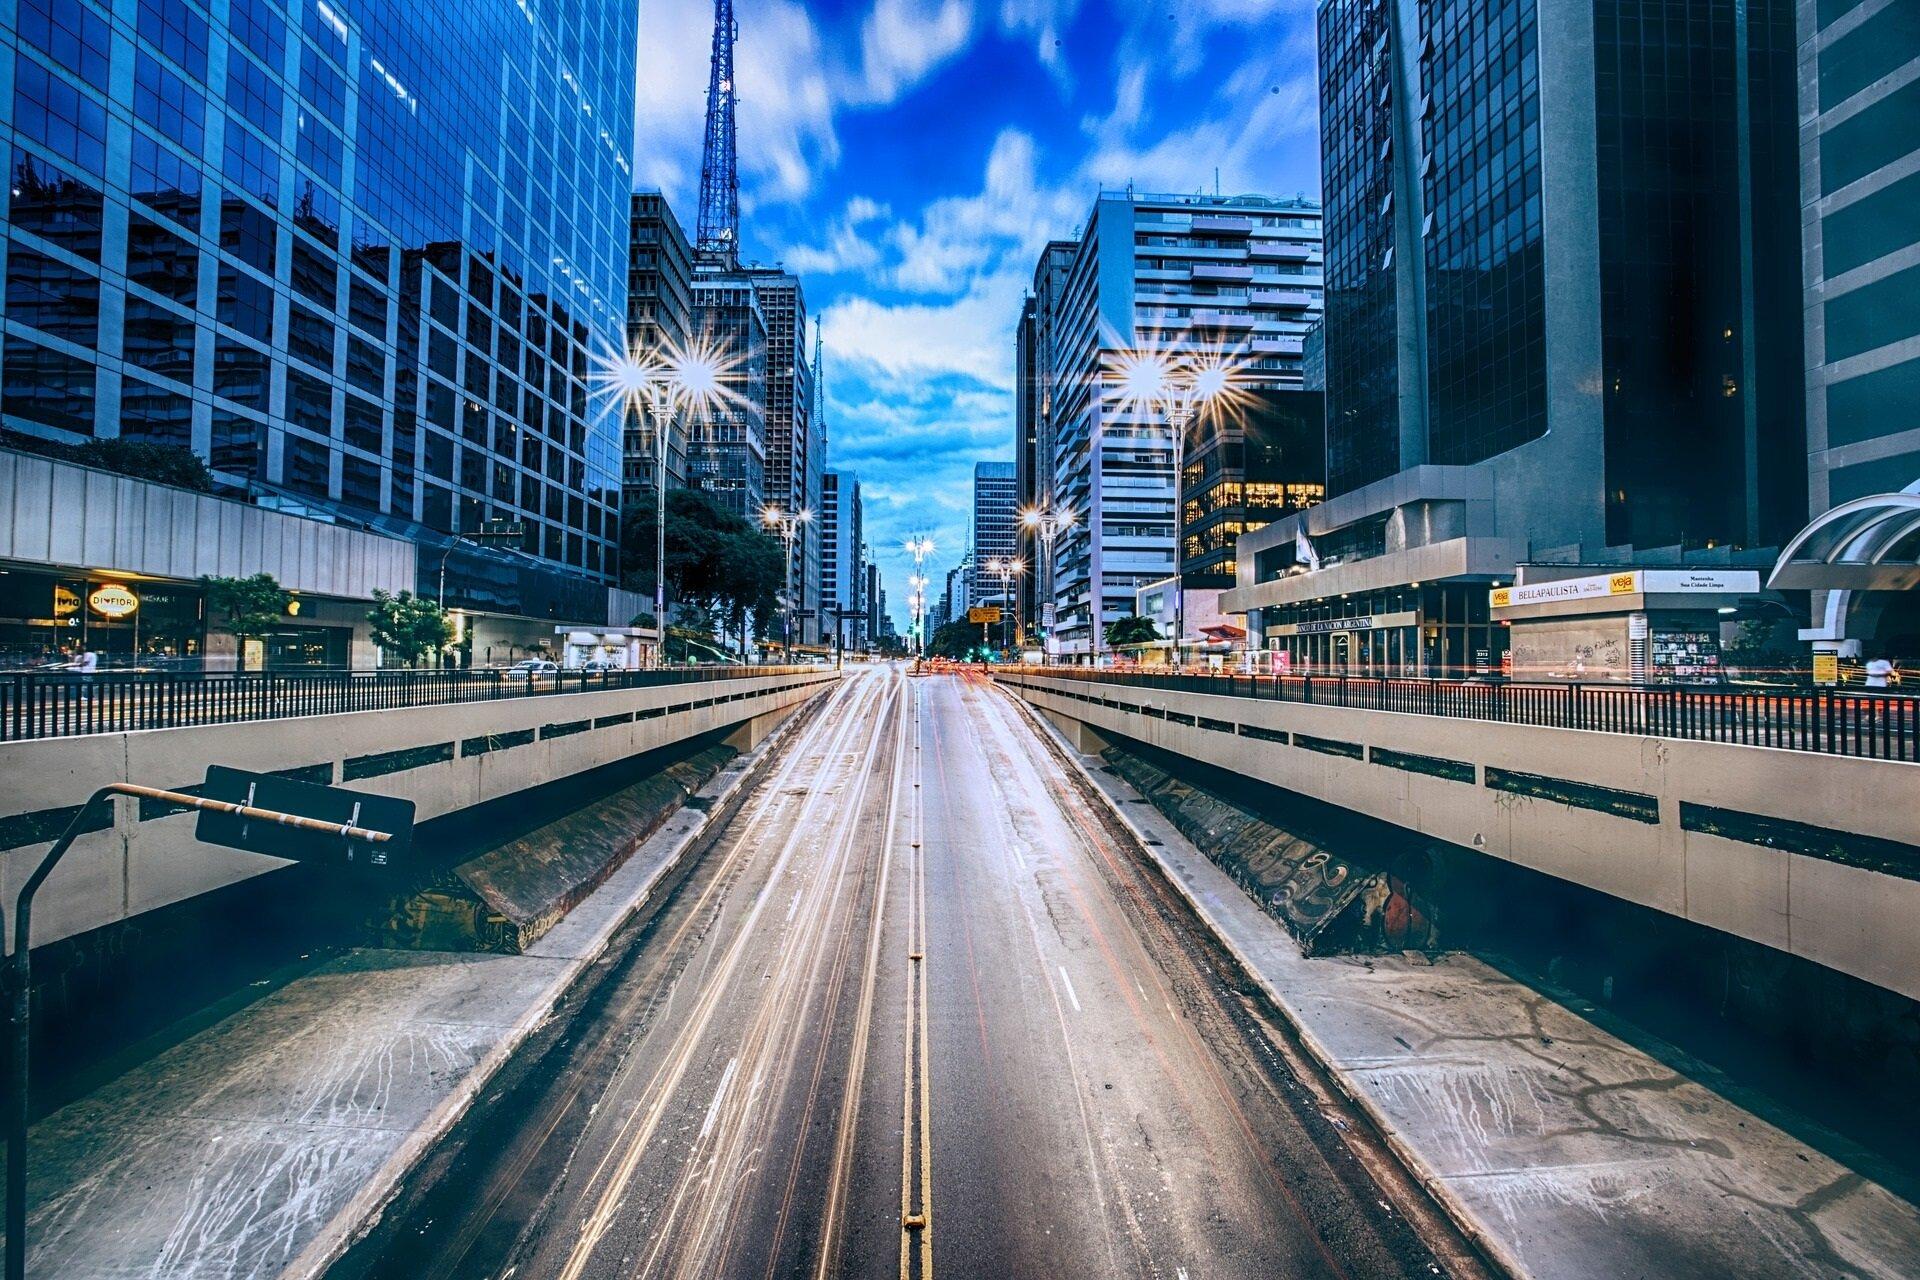 Urban - mobility